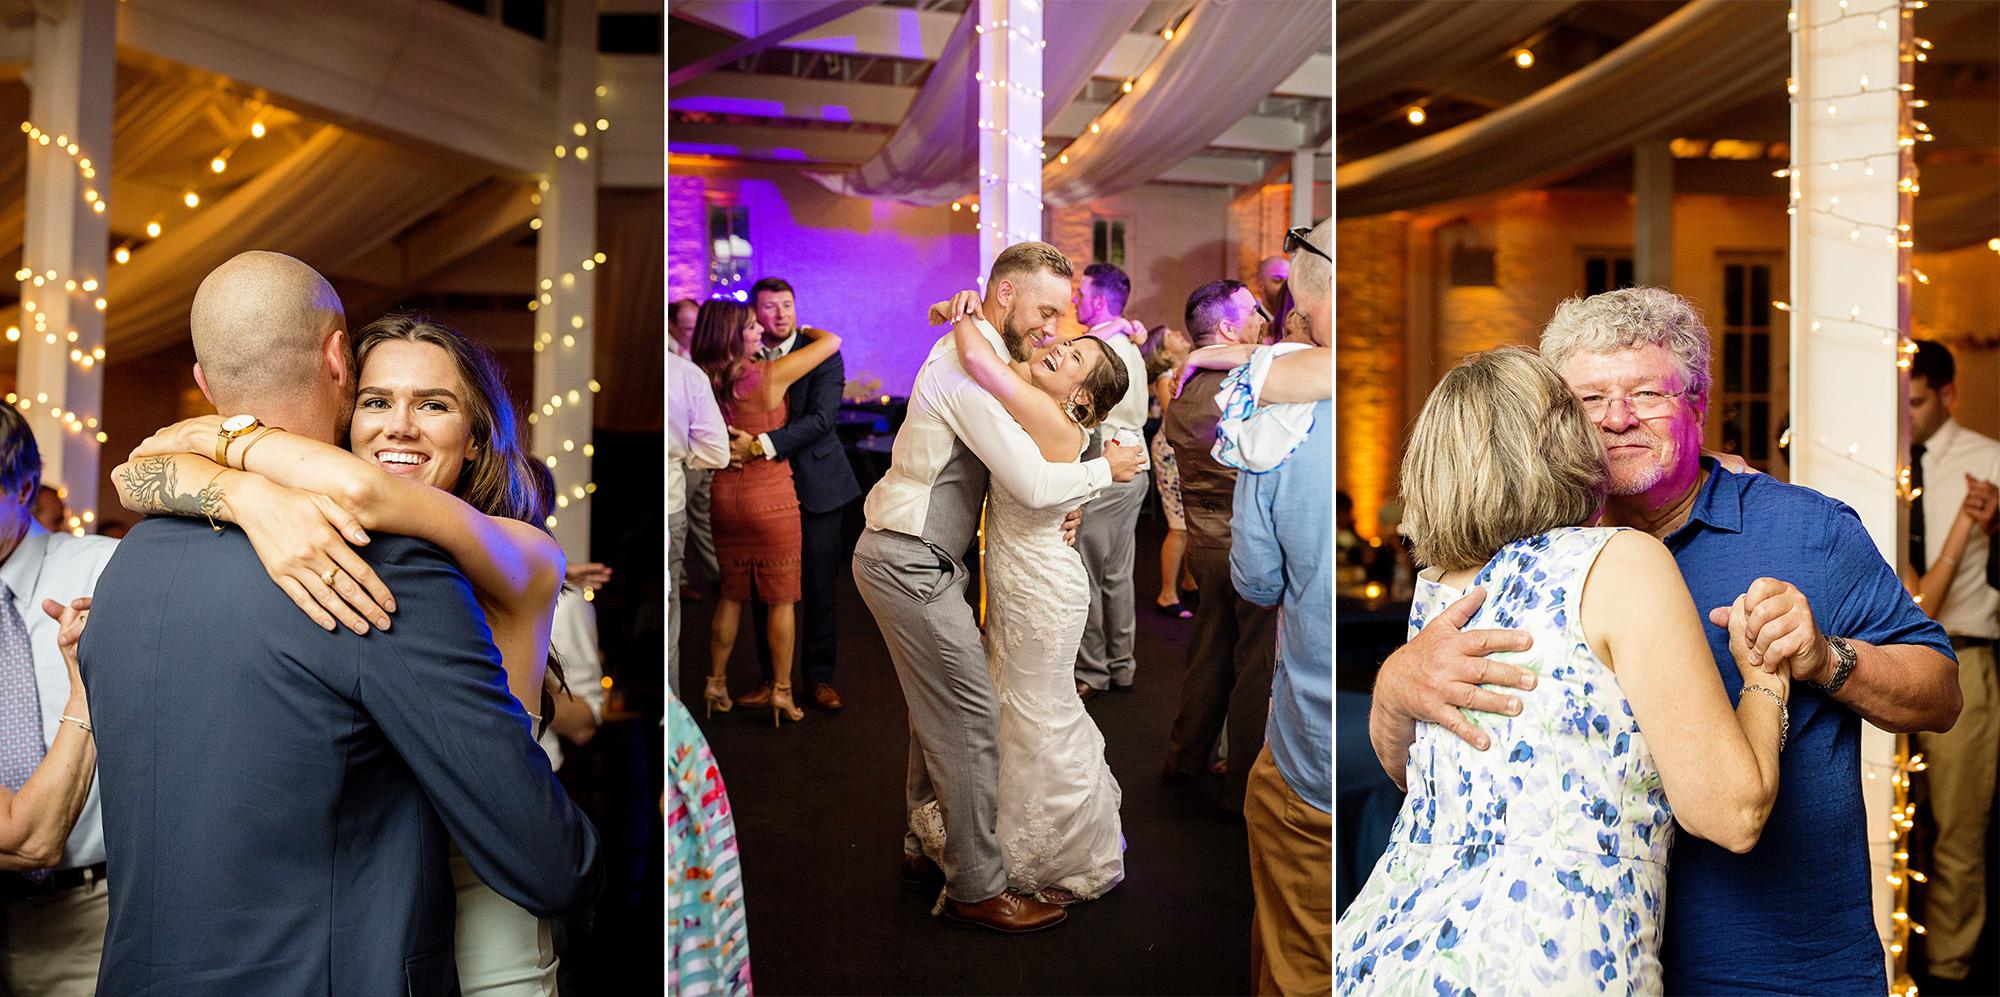 Seriously_Sabrina_Photography_Lexington_Kentucky_Round_Barn_Red_Mile_Stable_of_Memories_Wedding_Hart_133.jpg